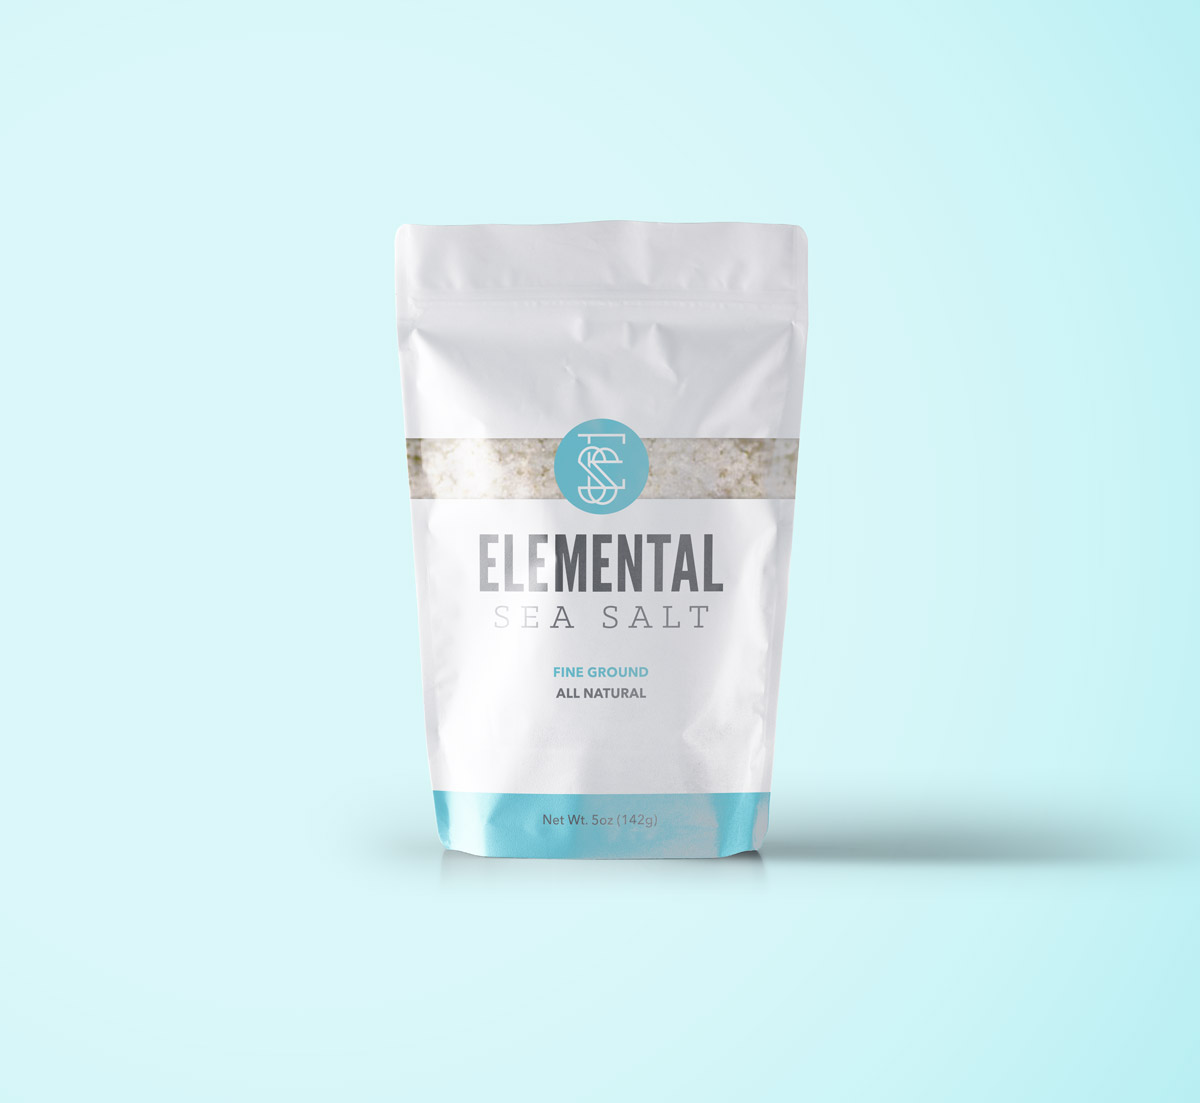 Elemental Sea Salt - Visual Brand and Logo Design - Packaging Print Design